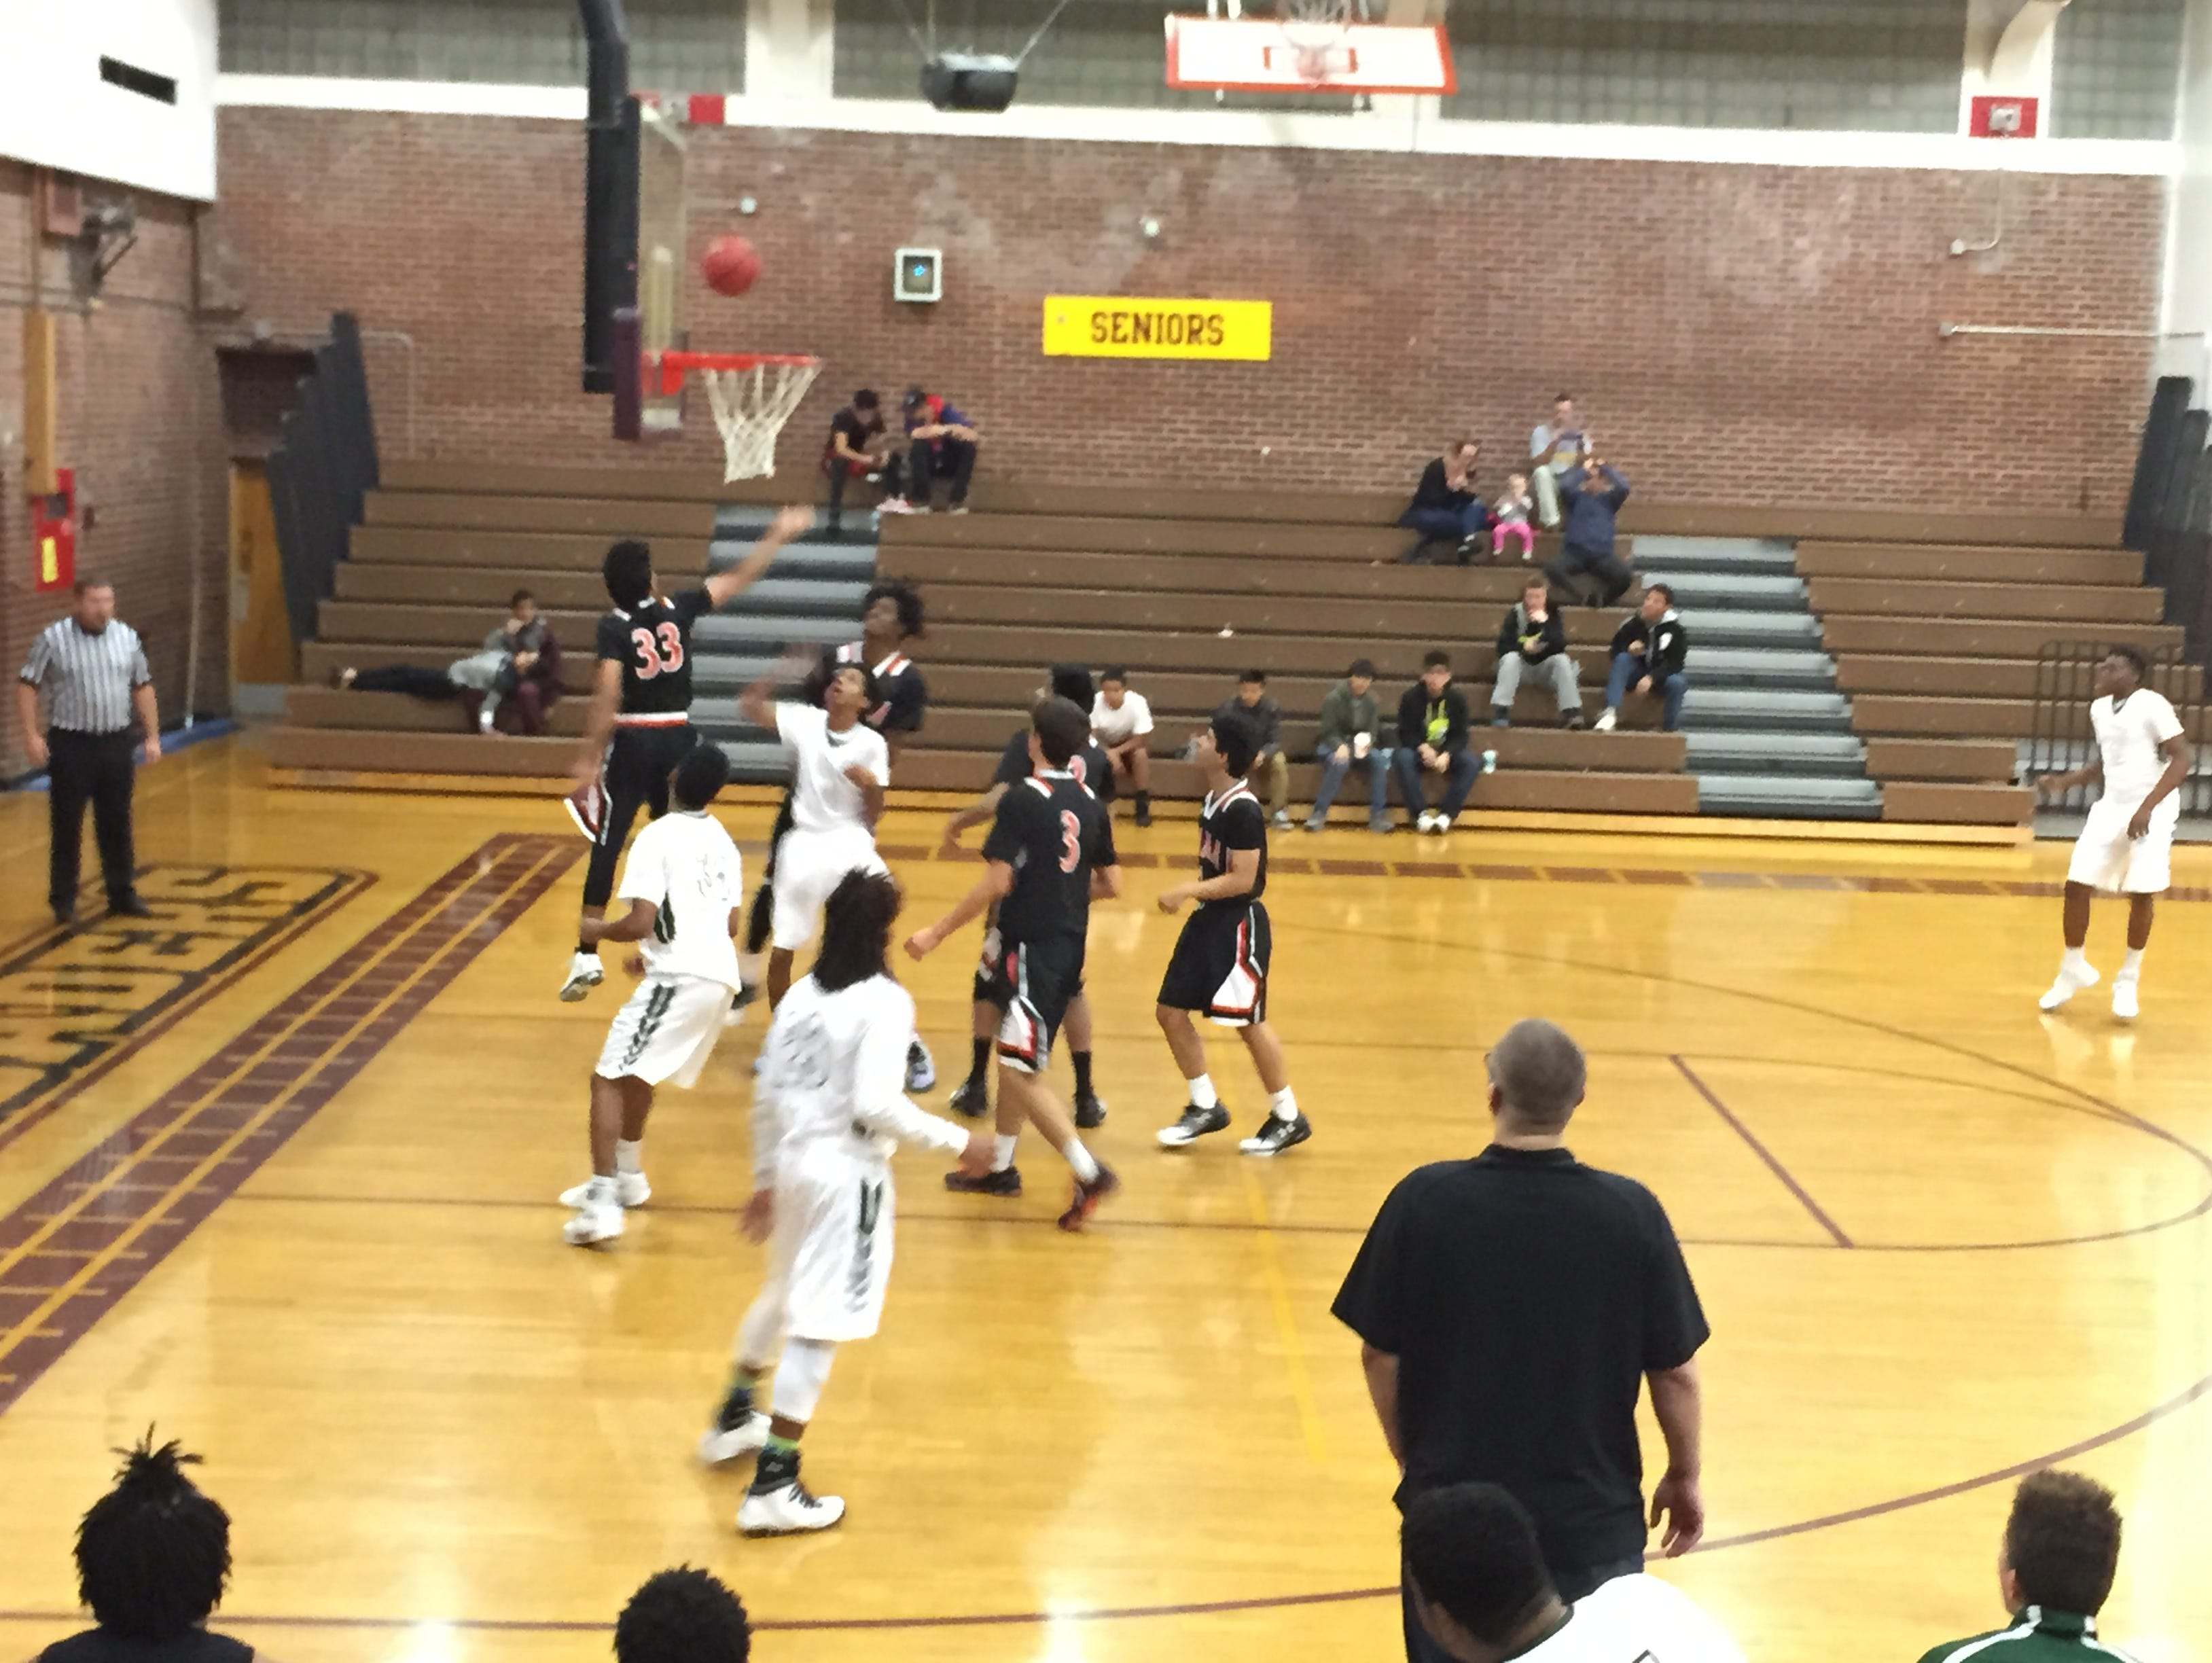 The Hug boys play Selma, Calif,., Monday night at Sparks High. Selma won, 68-45.